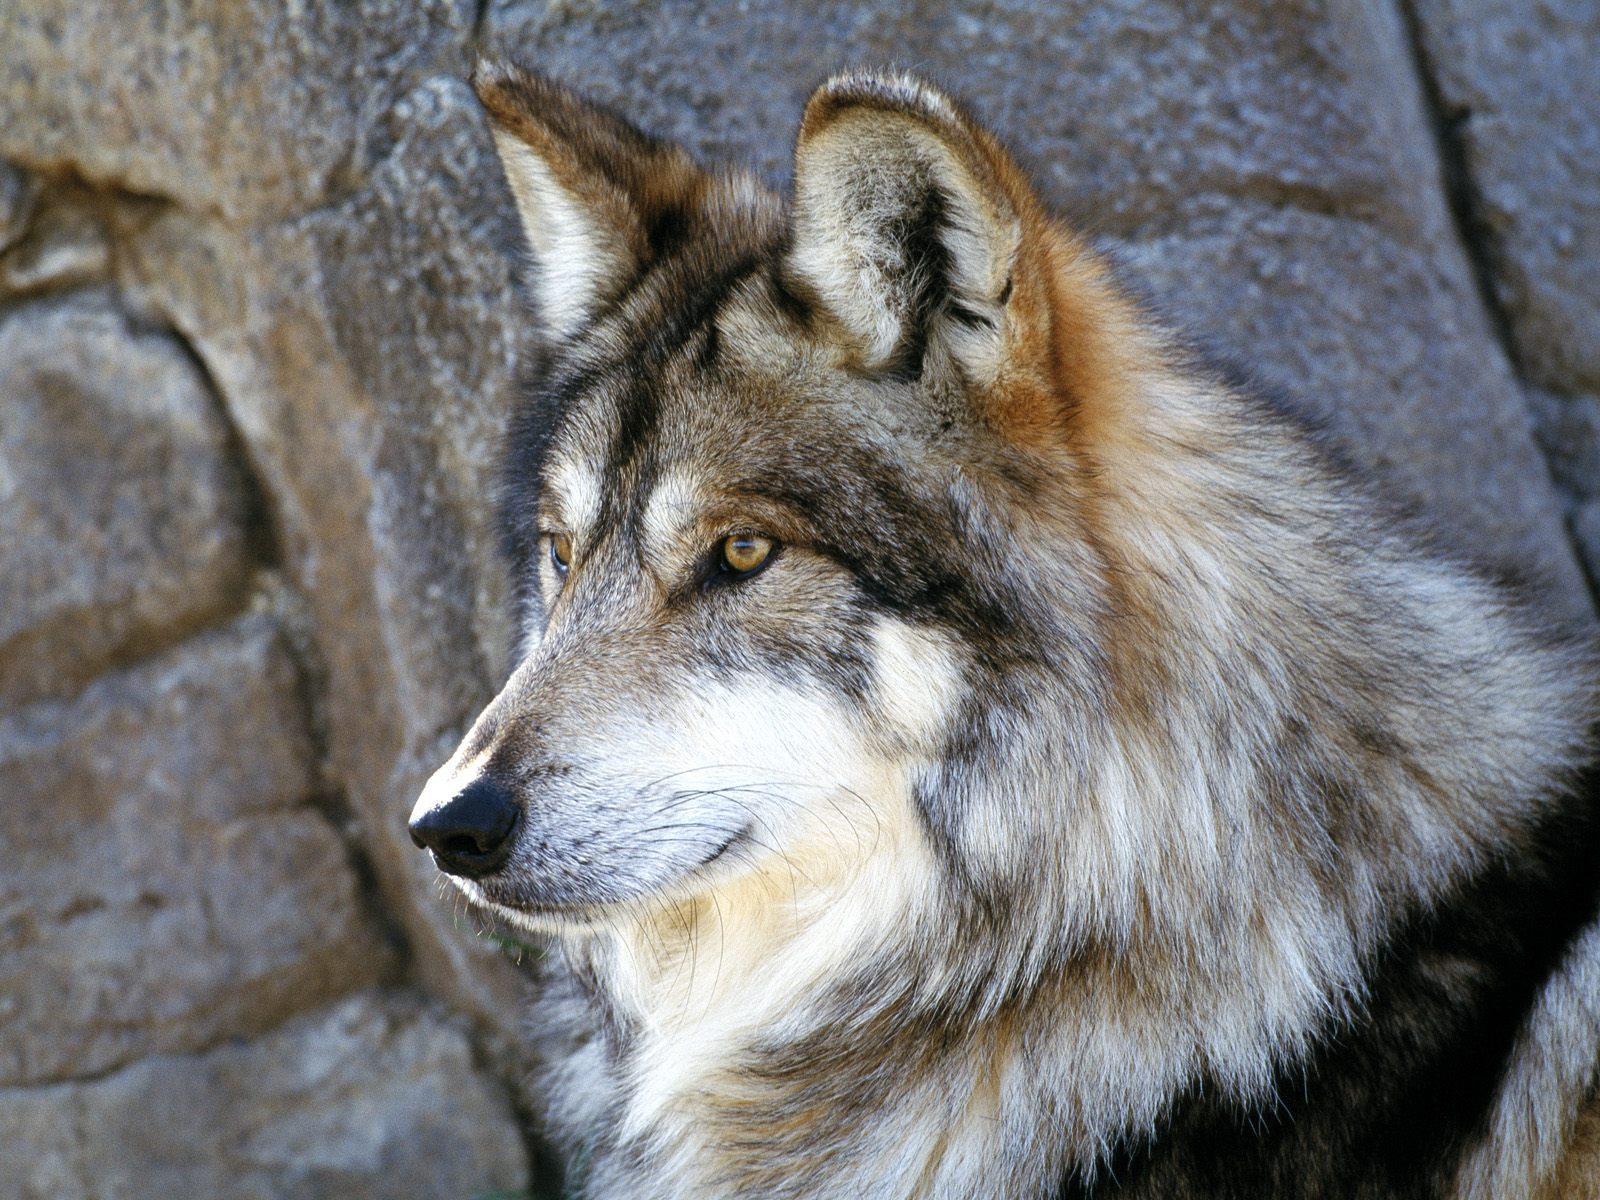 http://wolf-whisper305.tripod.com/sitebuildercontent/sitebuilderpictures/mexicanwol.jpg